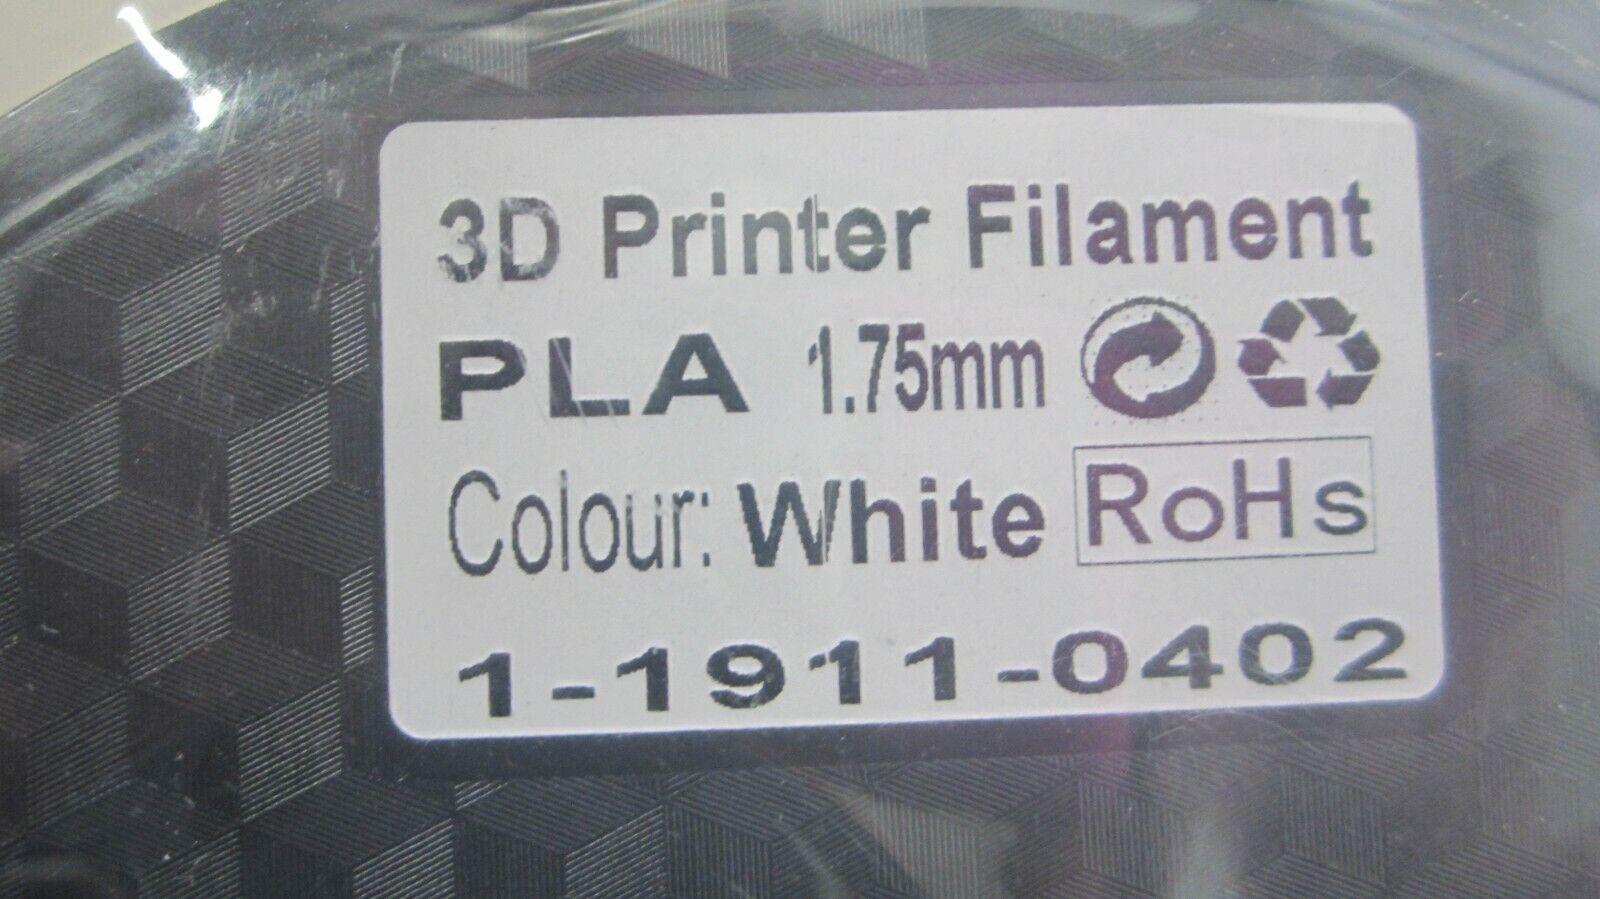 3D Printer Filament, PLA 1.75 mm, White, RoHs, 1 -1911 -0402